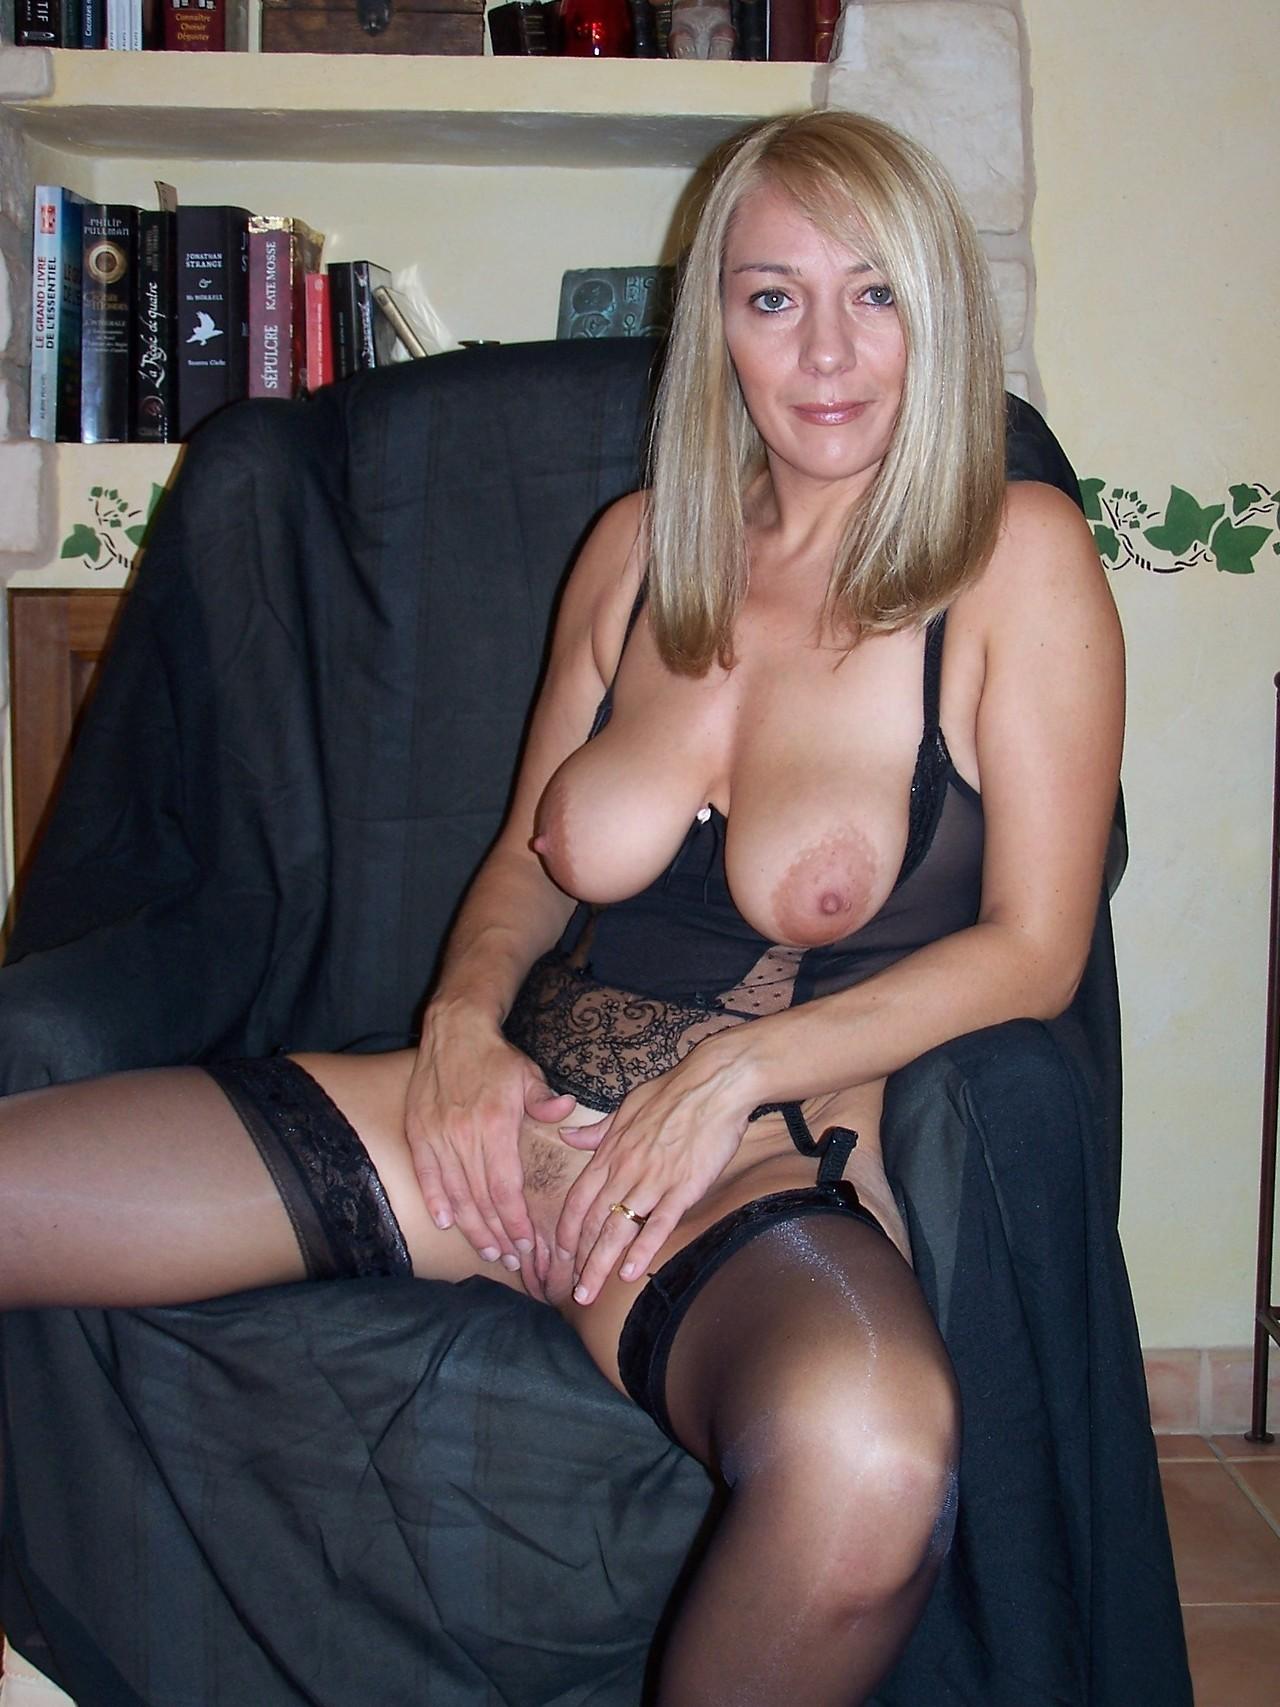 Muri hwnai sex pics on browap